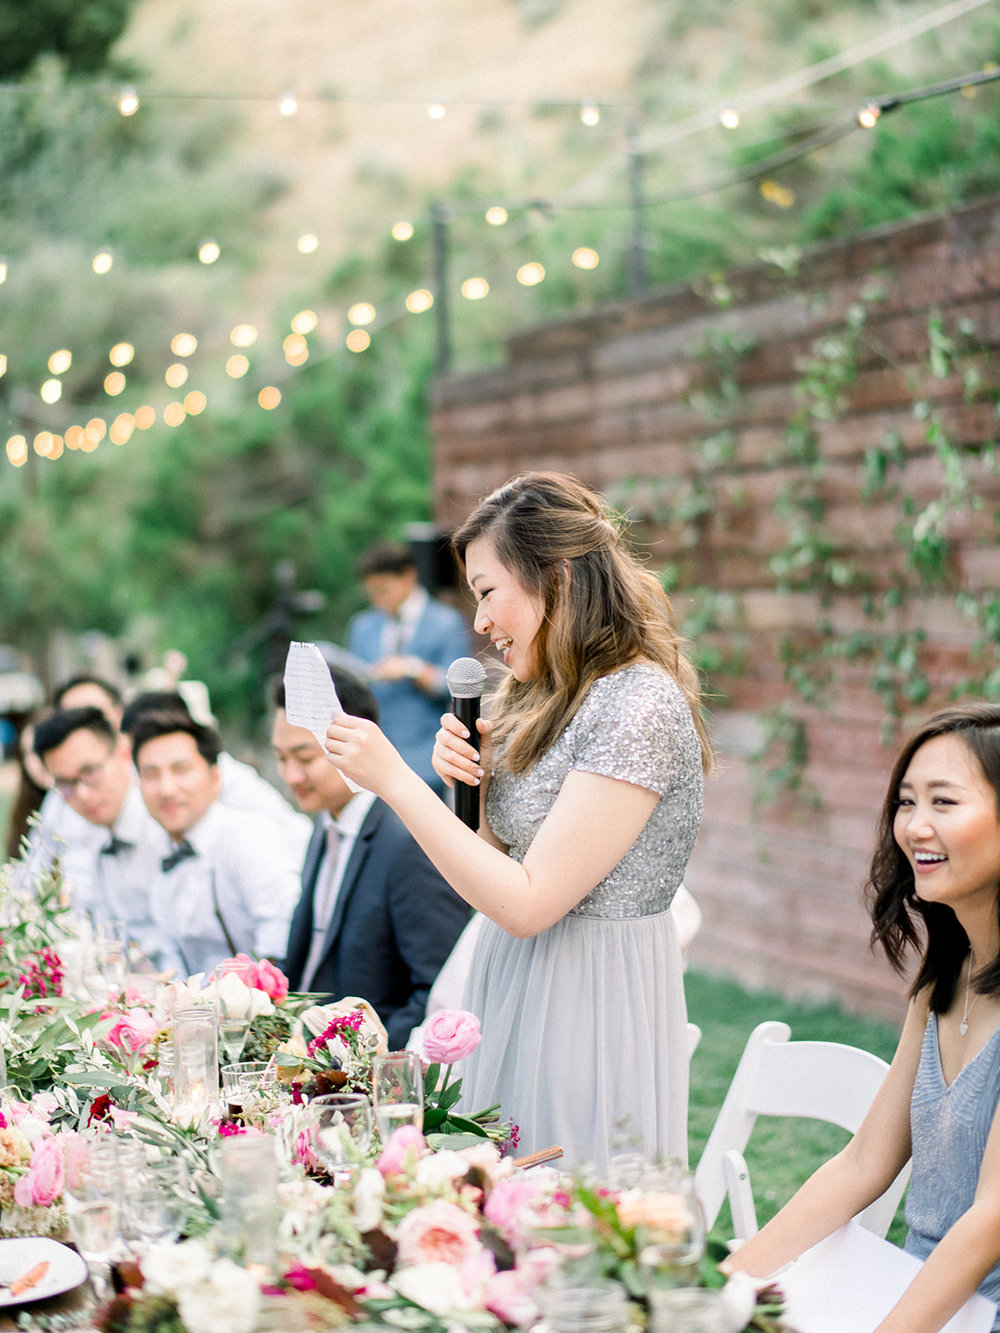 jueunandjon-etherandsmith-wedding-1473.jpg